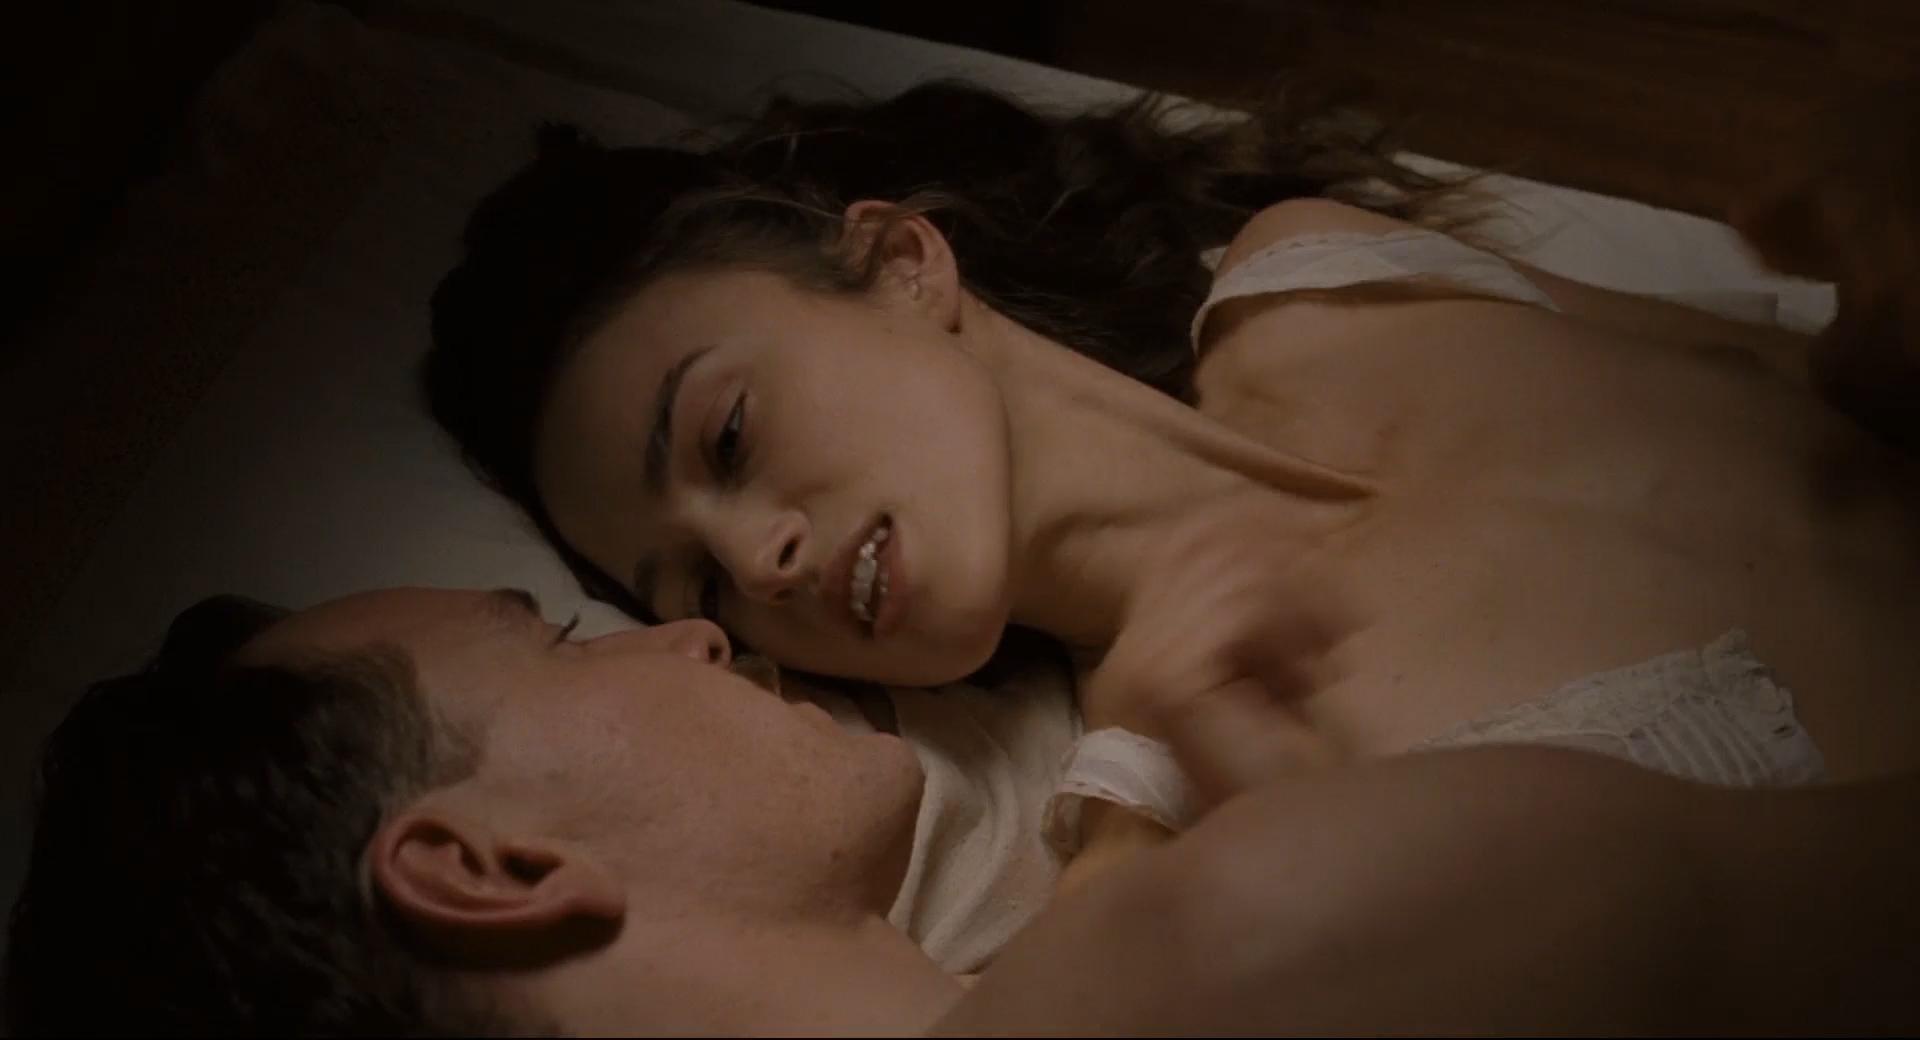 Keira Knightley Nude Topless Sarah Marecek And Anna -1508